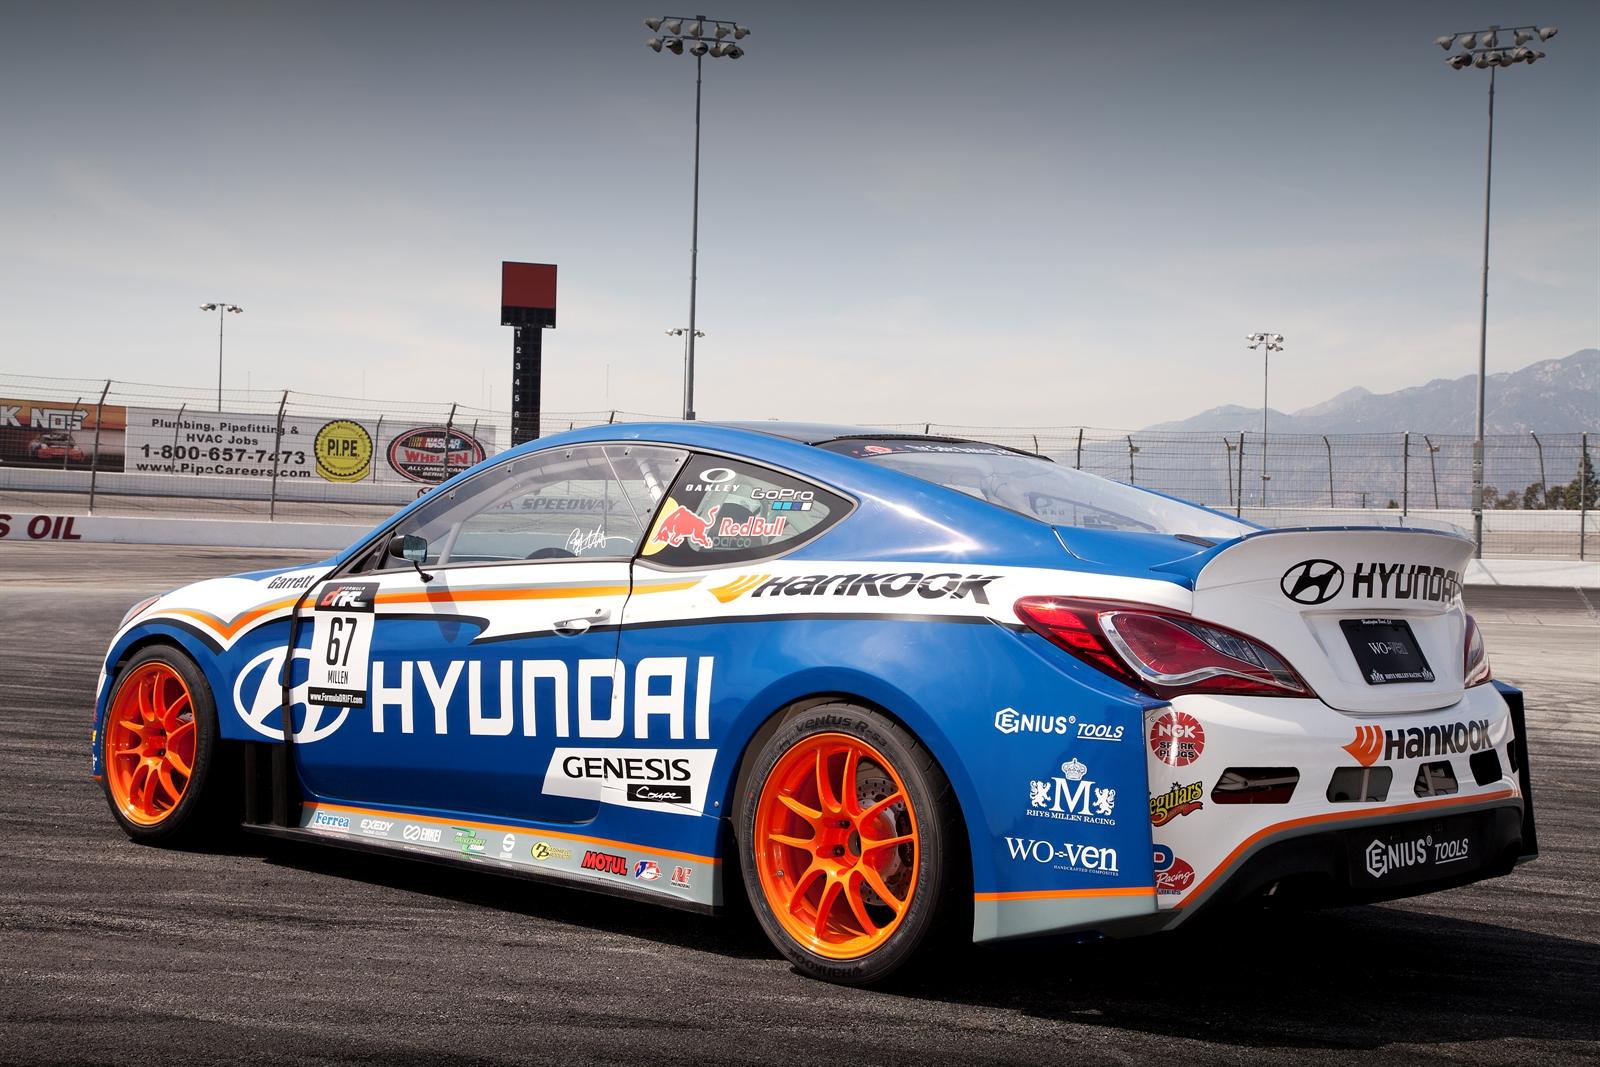 Nissan Warranties 2013 Hyundai Genesis Coupe Formula Drift Car - autoevolution